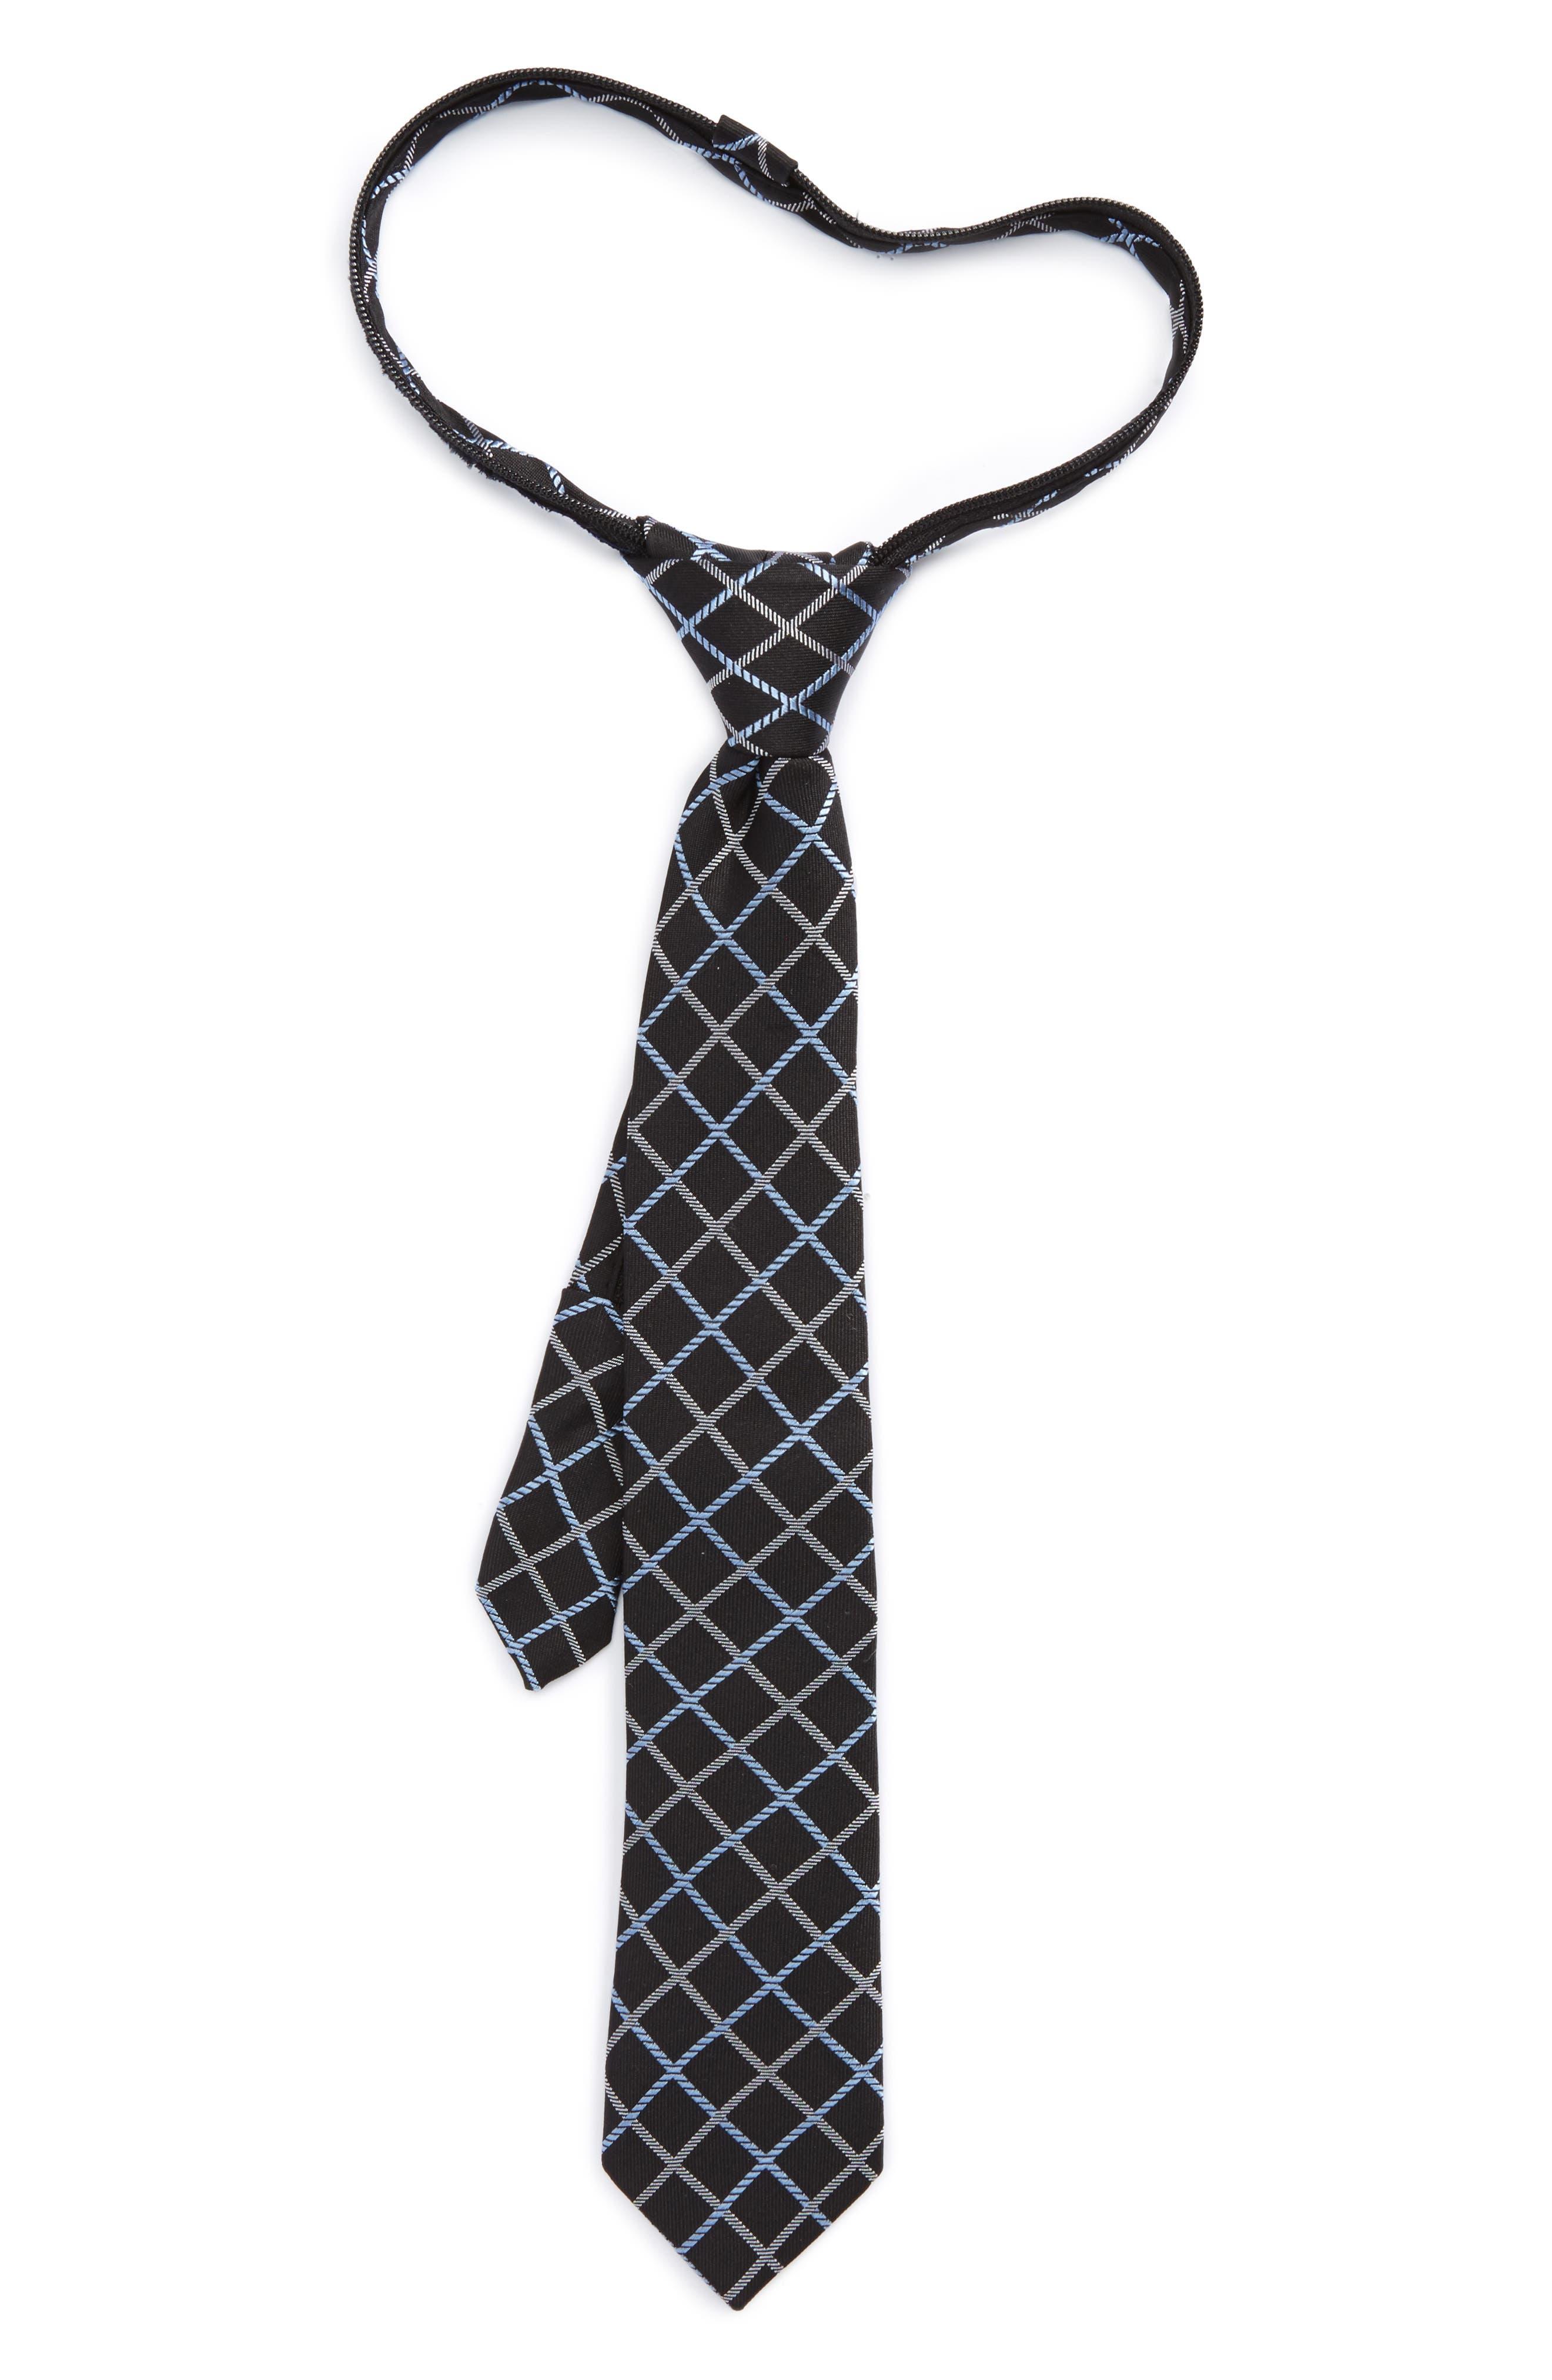 Plaid Silk Zip Tie,                             Main thumbnail 1, color,                             Black